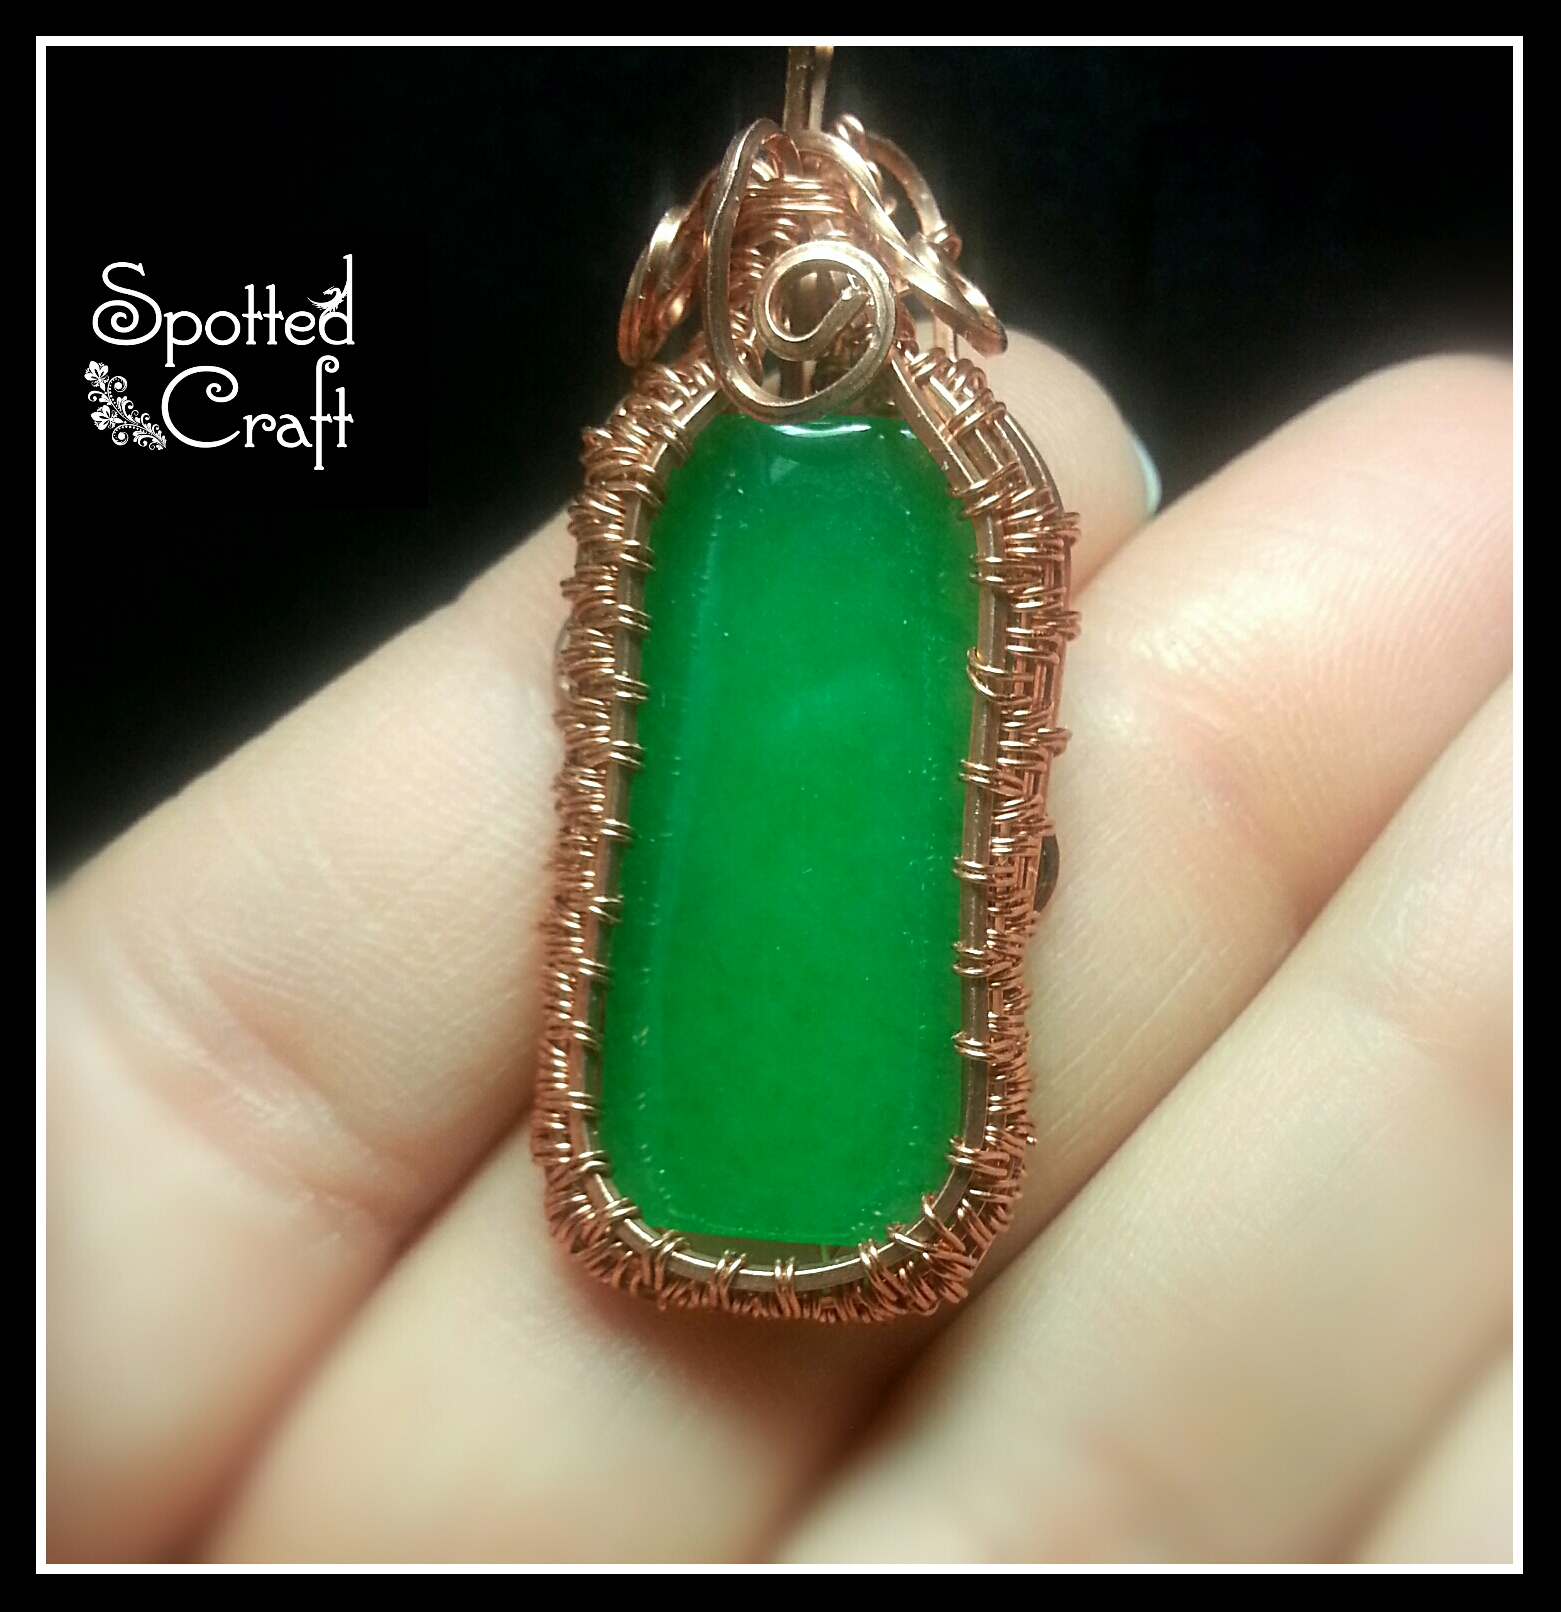 Simply elegant framed stone pendant spotted craft for Elegant stone